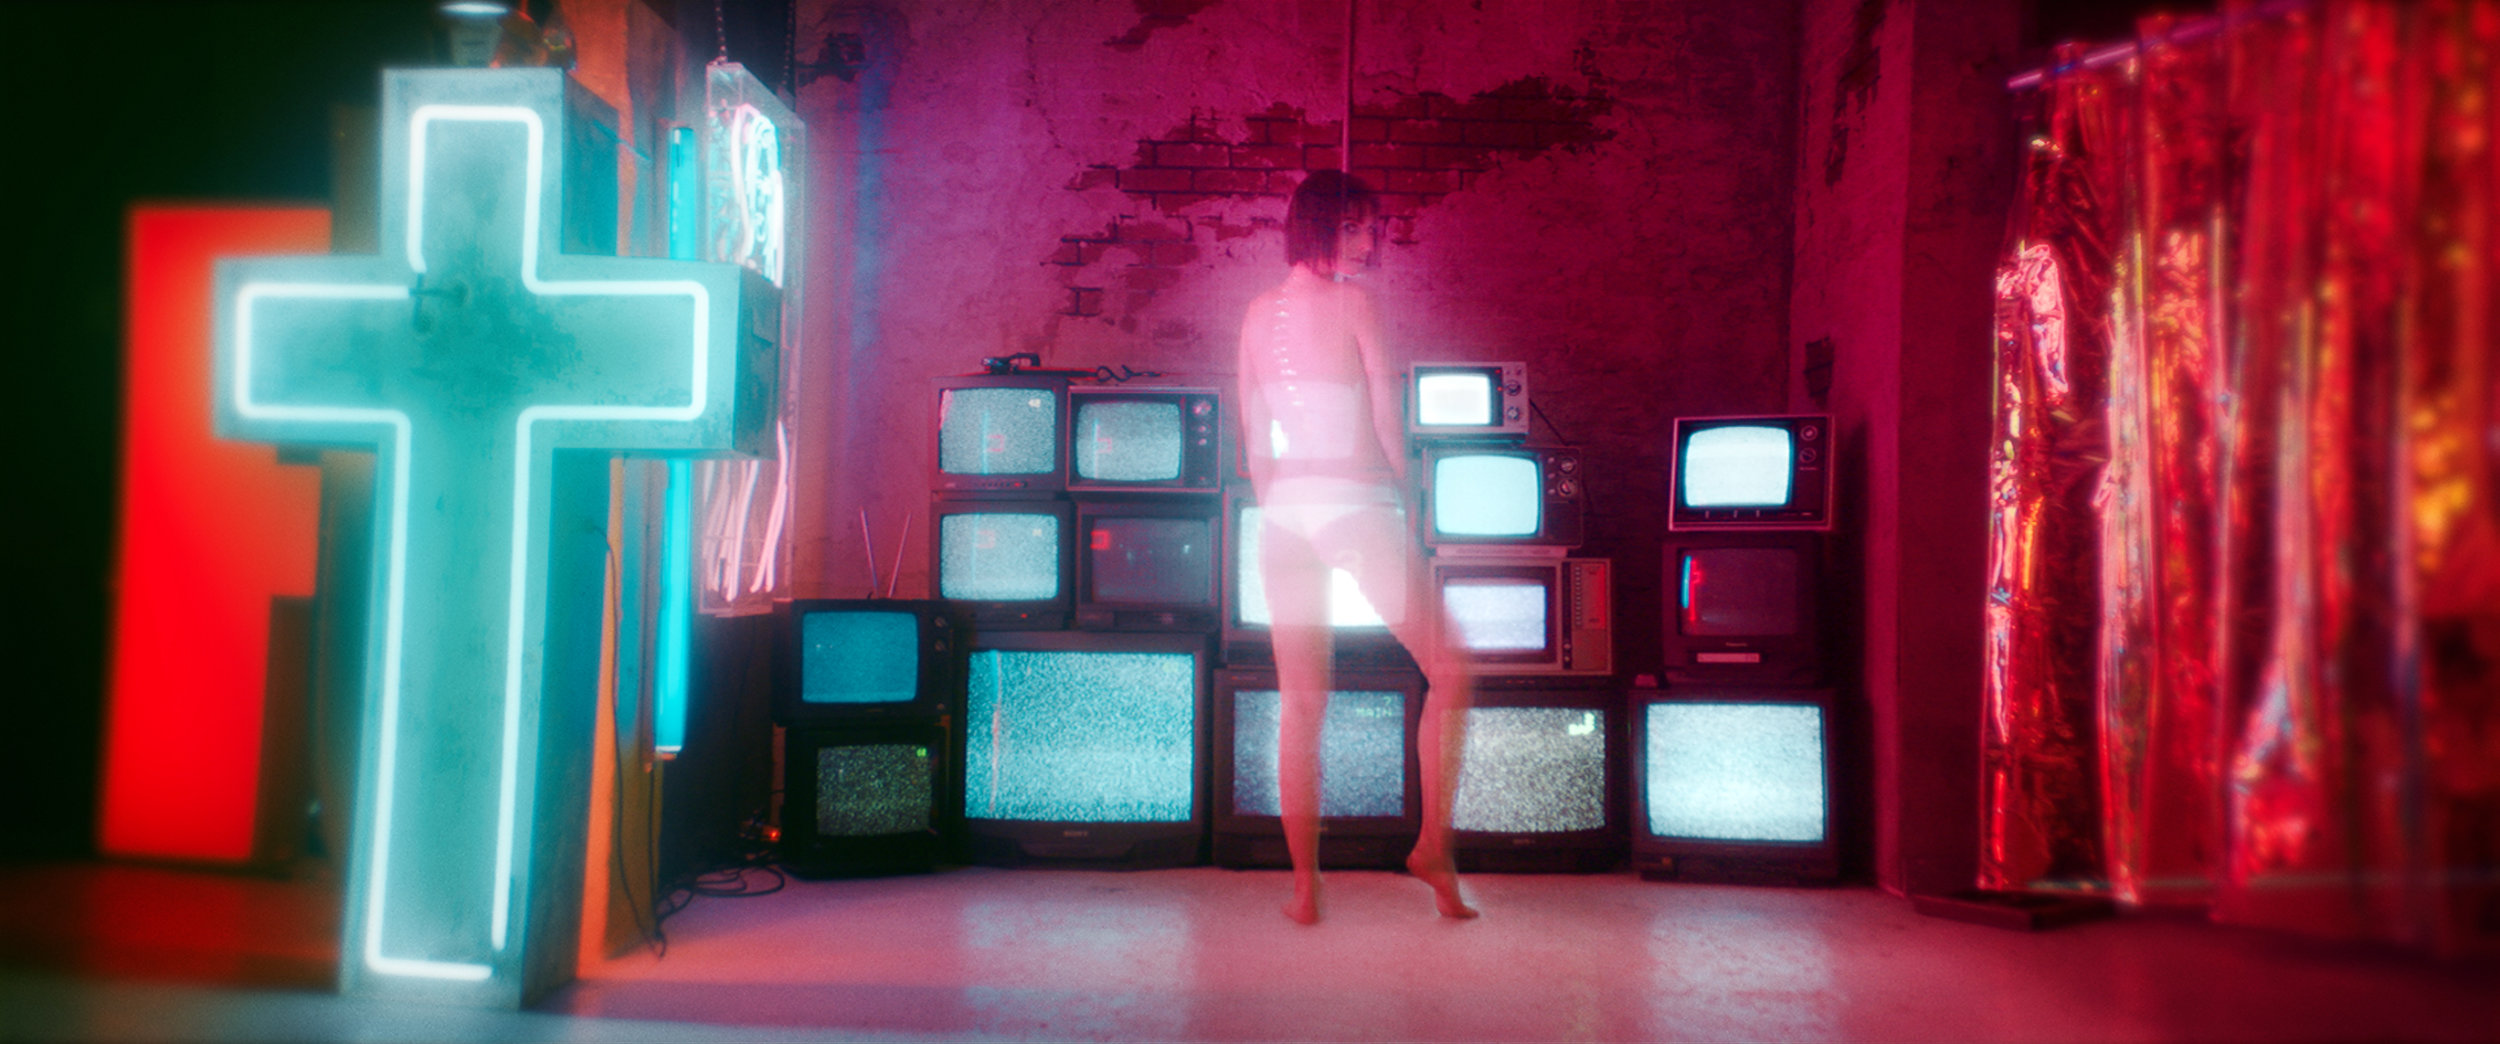 TV002.jpg